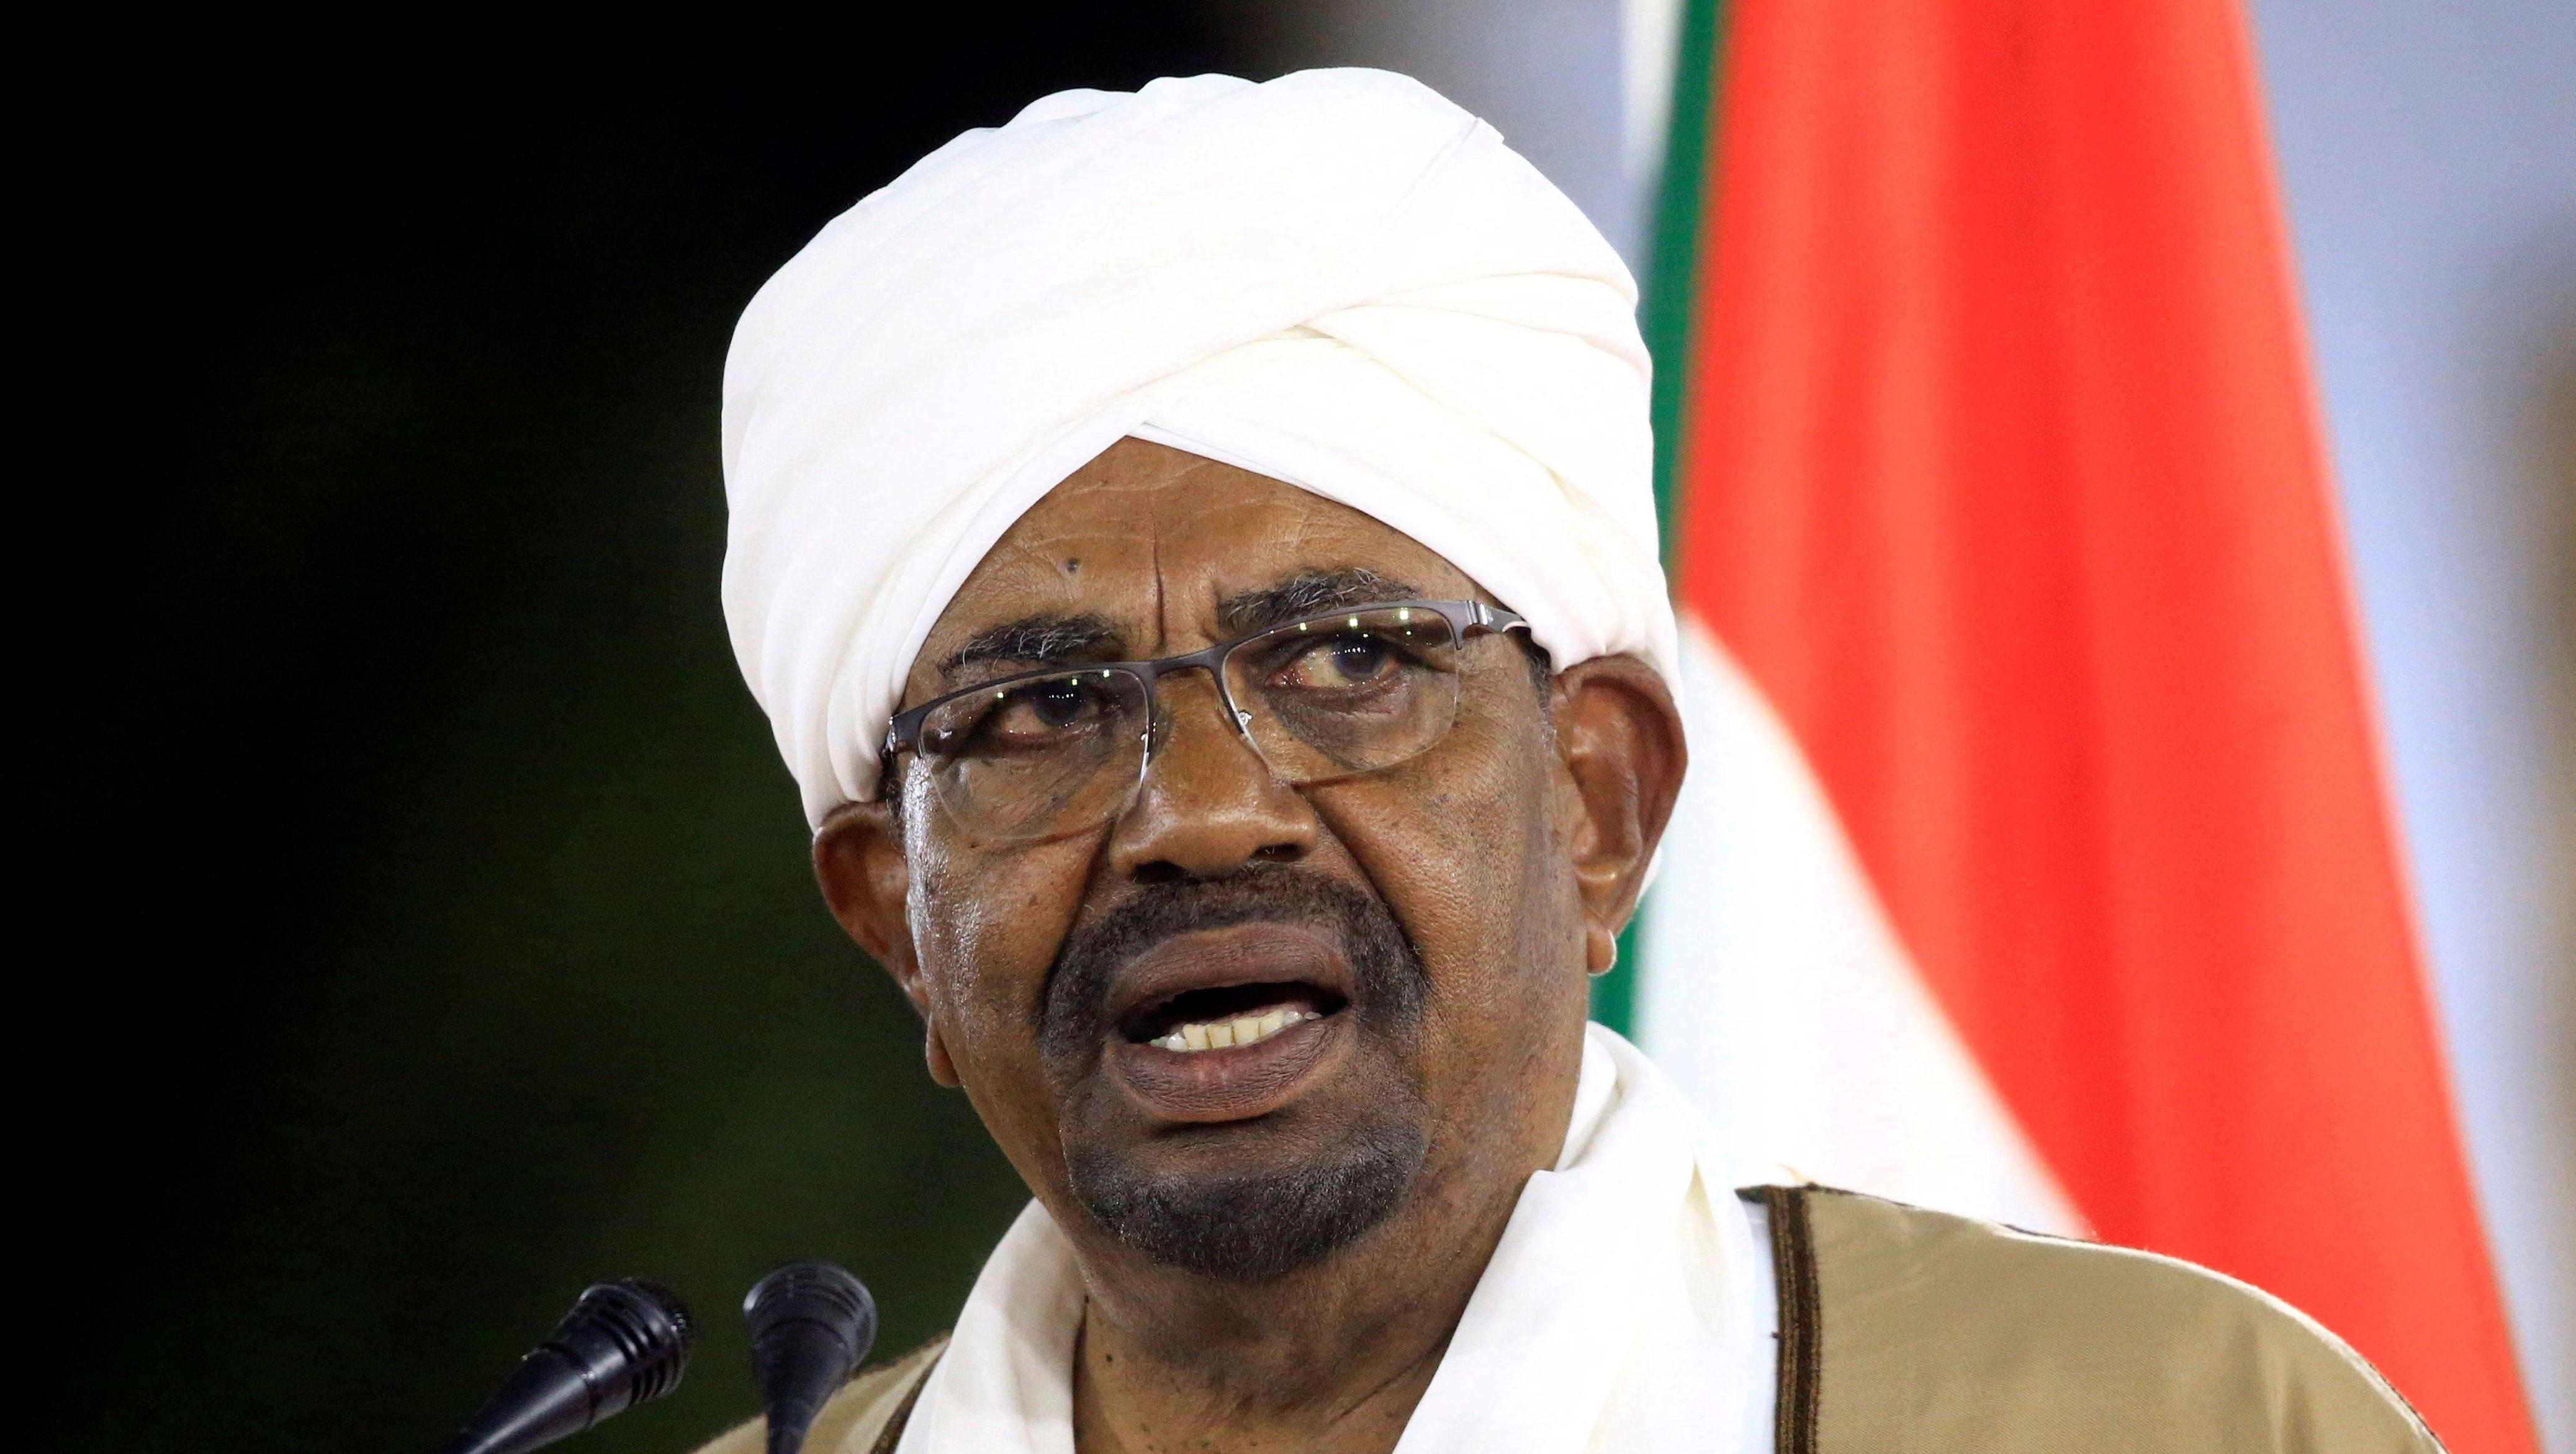 FILE PHOTO: Sudan's President Omar al-Bashir delivers a speech at the Presidential Palace in Khartoum, Sudan February 22, 2019.